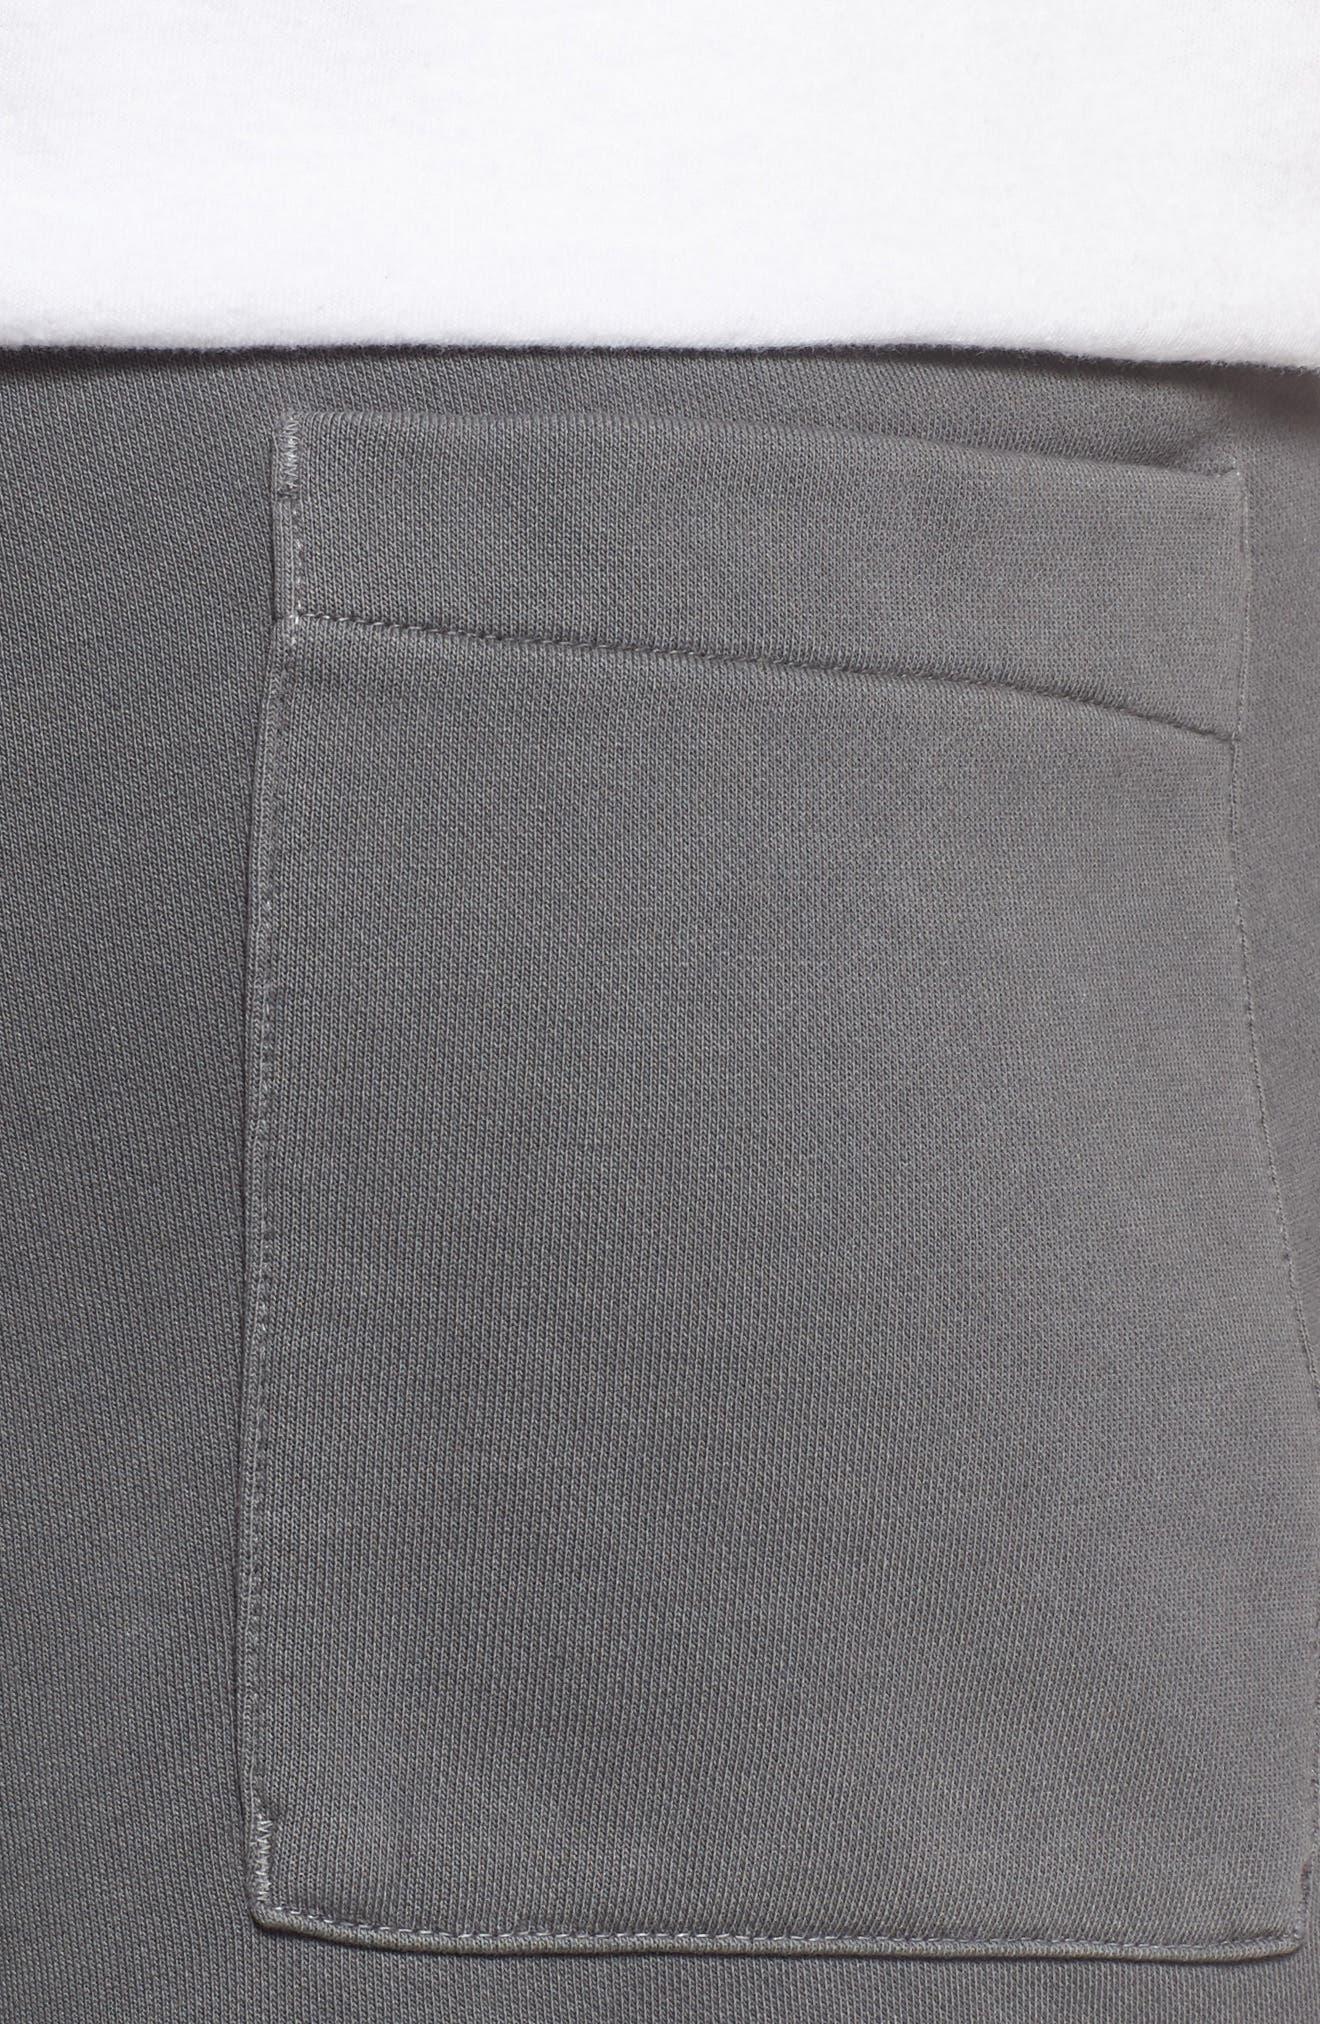 NSW Cotton Blend Shorts,                             Alternate thumbnail 4, color,                             010